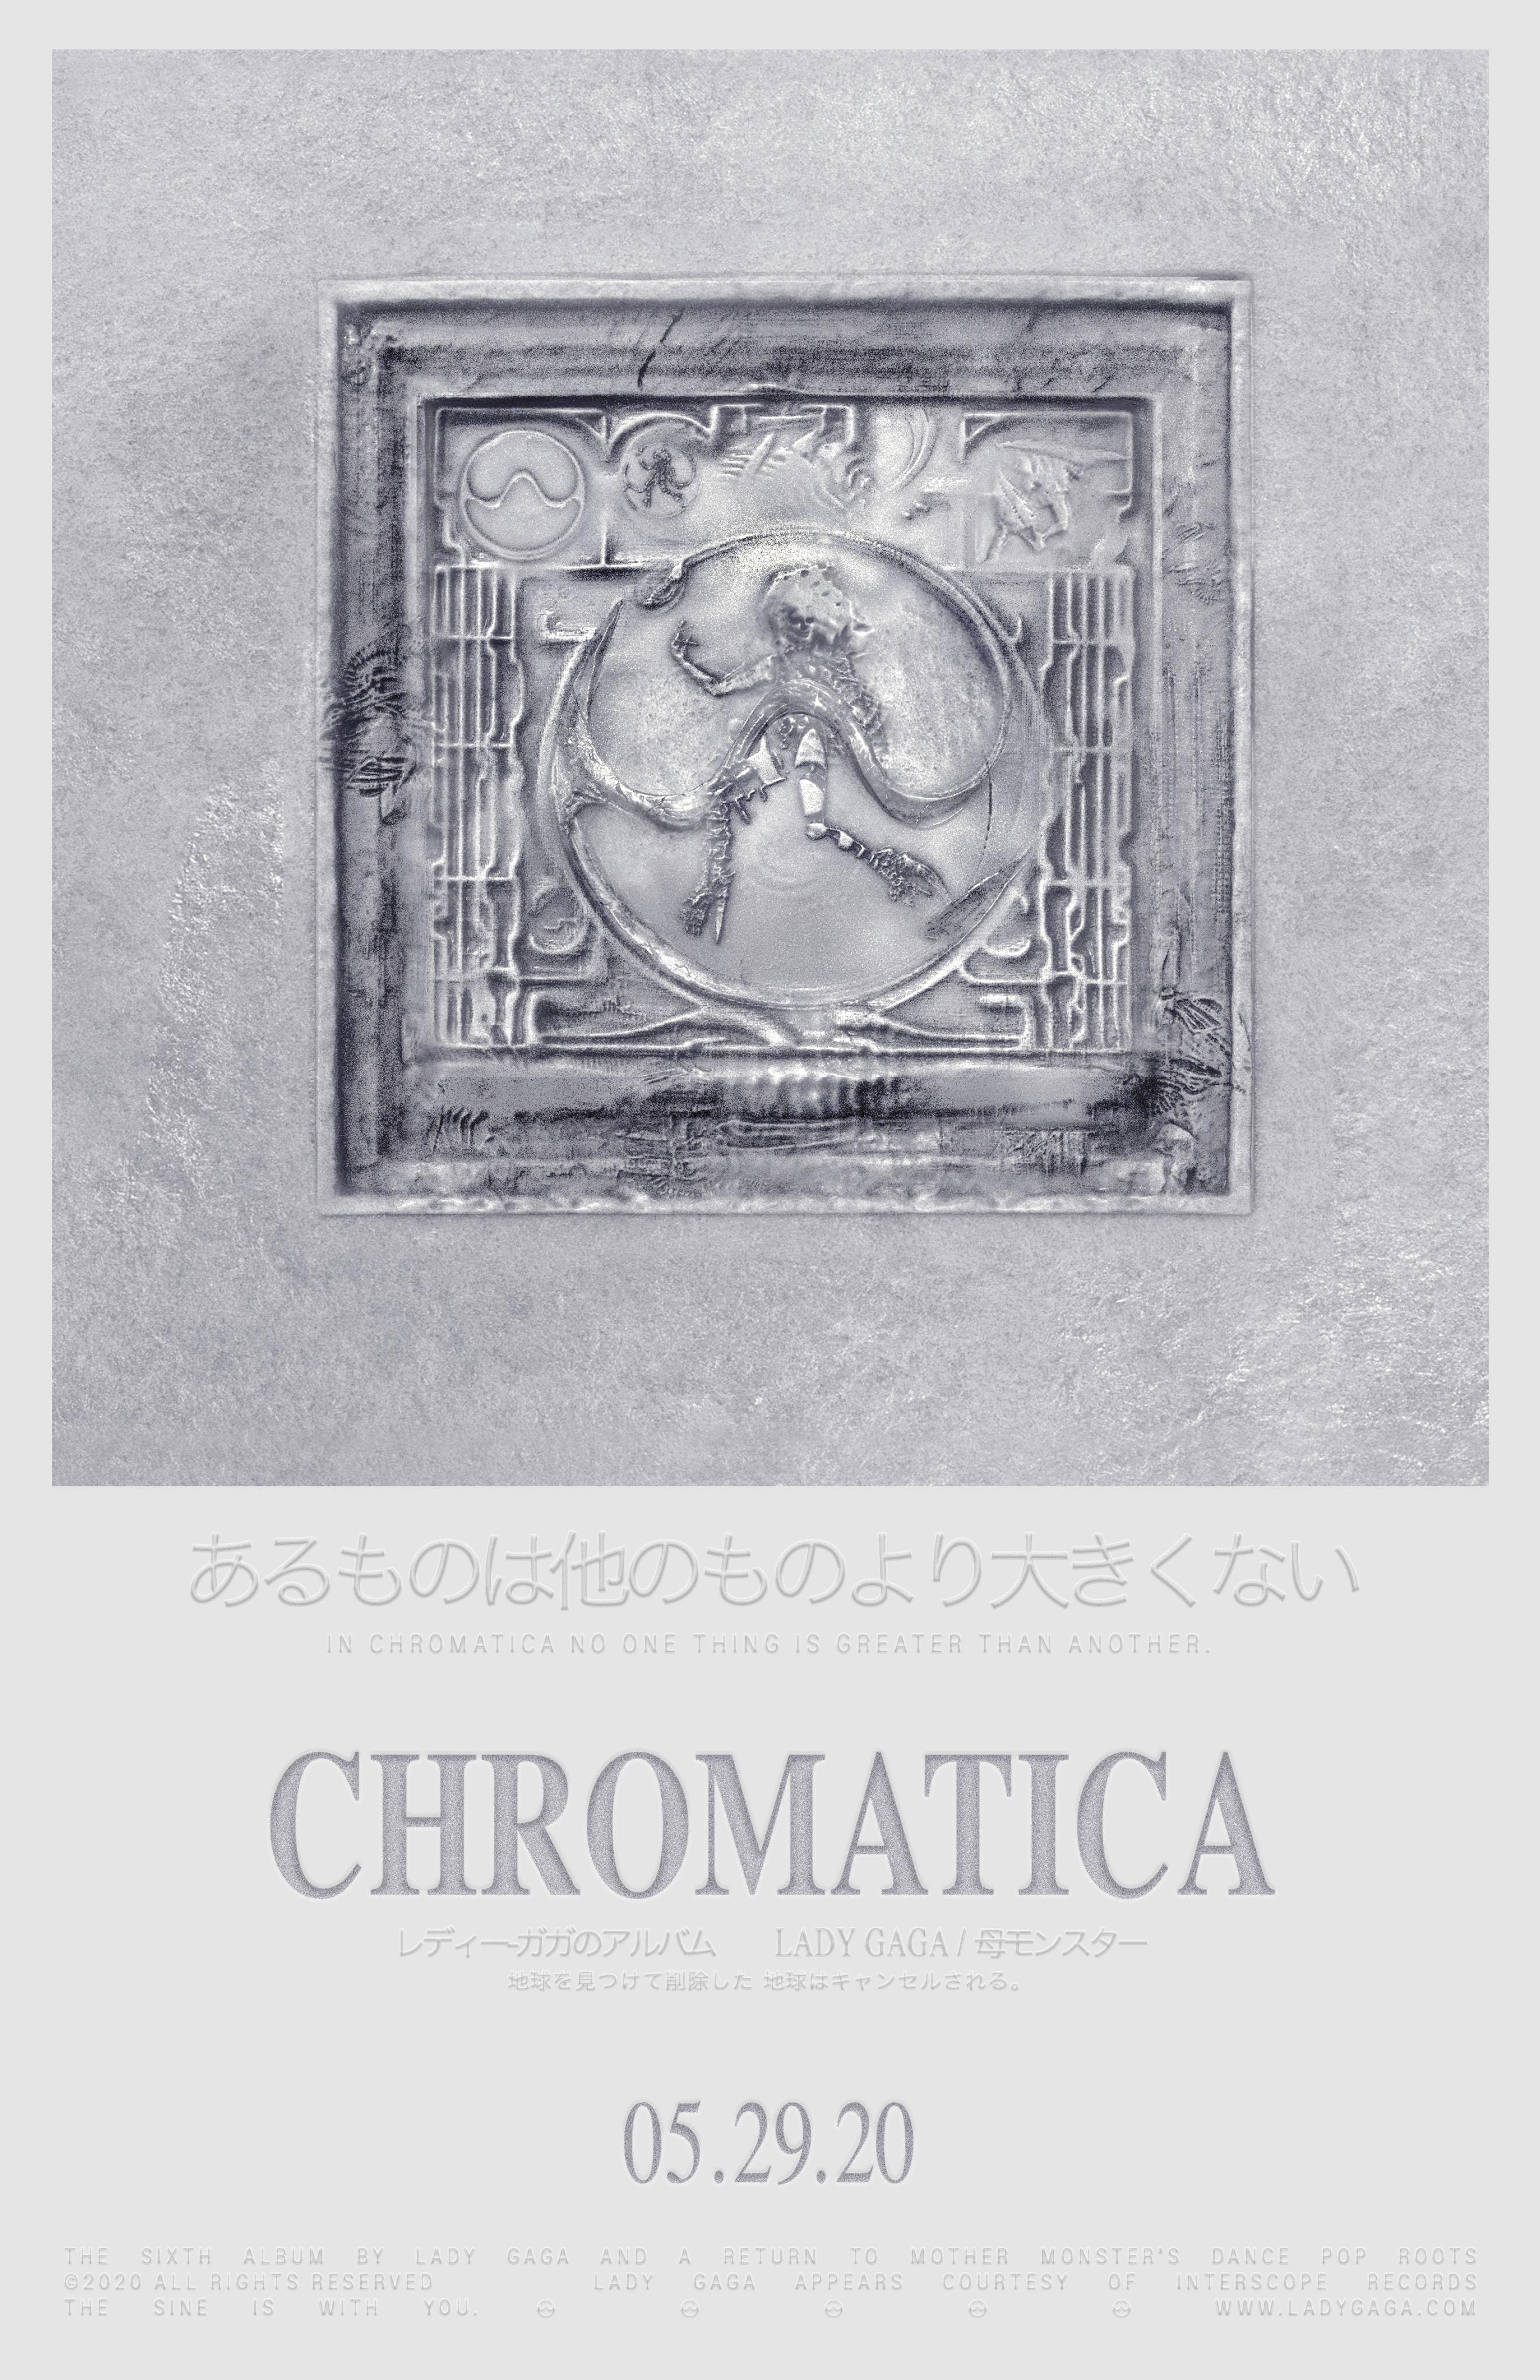 CHROMATICA-NEO-GRAY-02.jpg